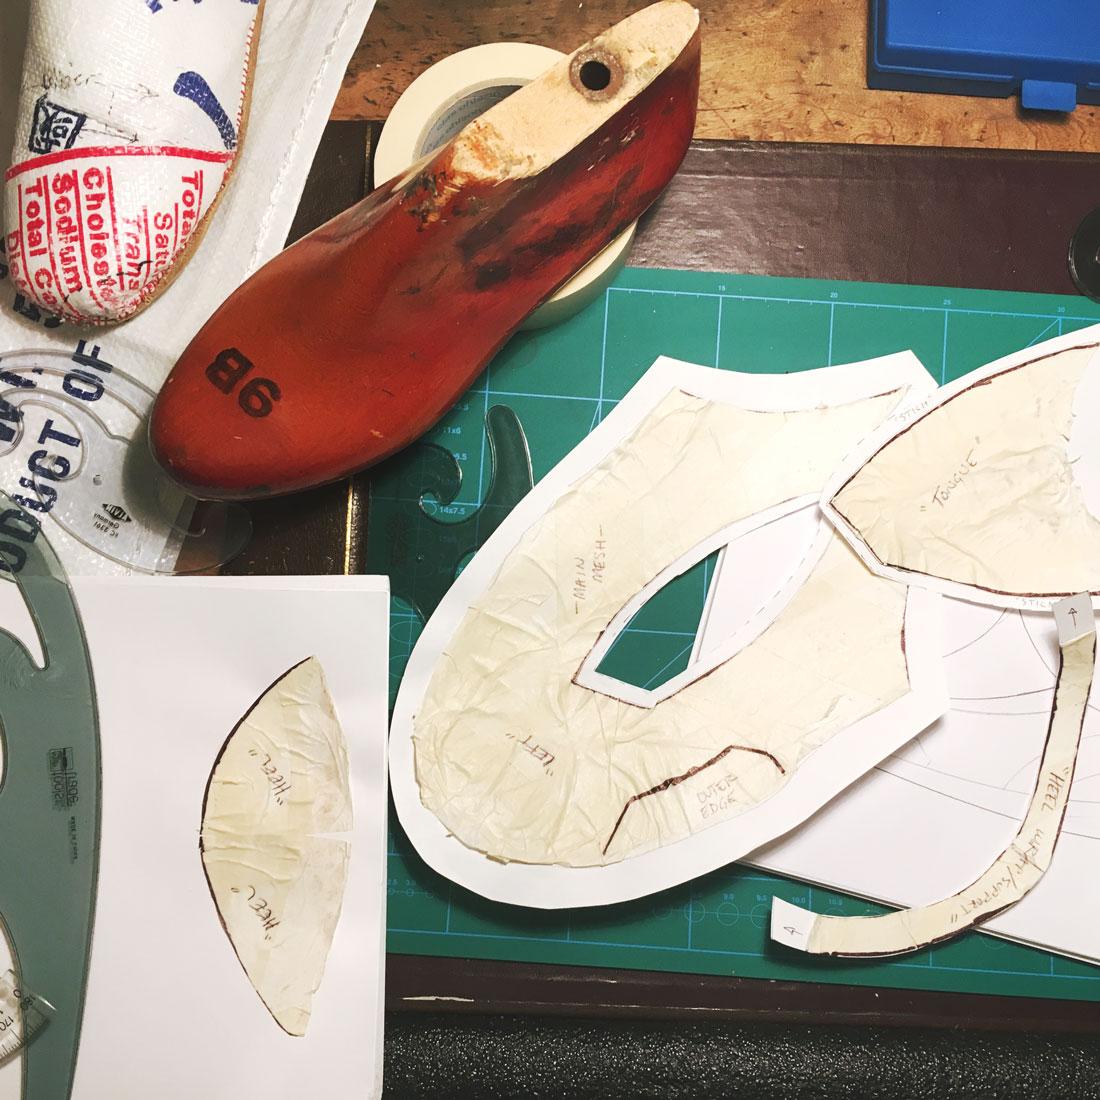 Buhay-developing-sustainabal_Shoes_006_2019.jpg